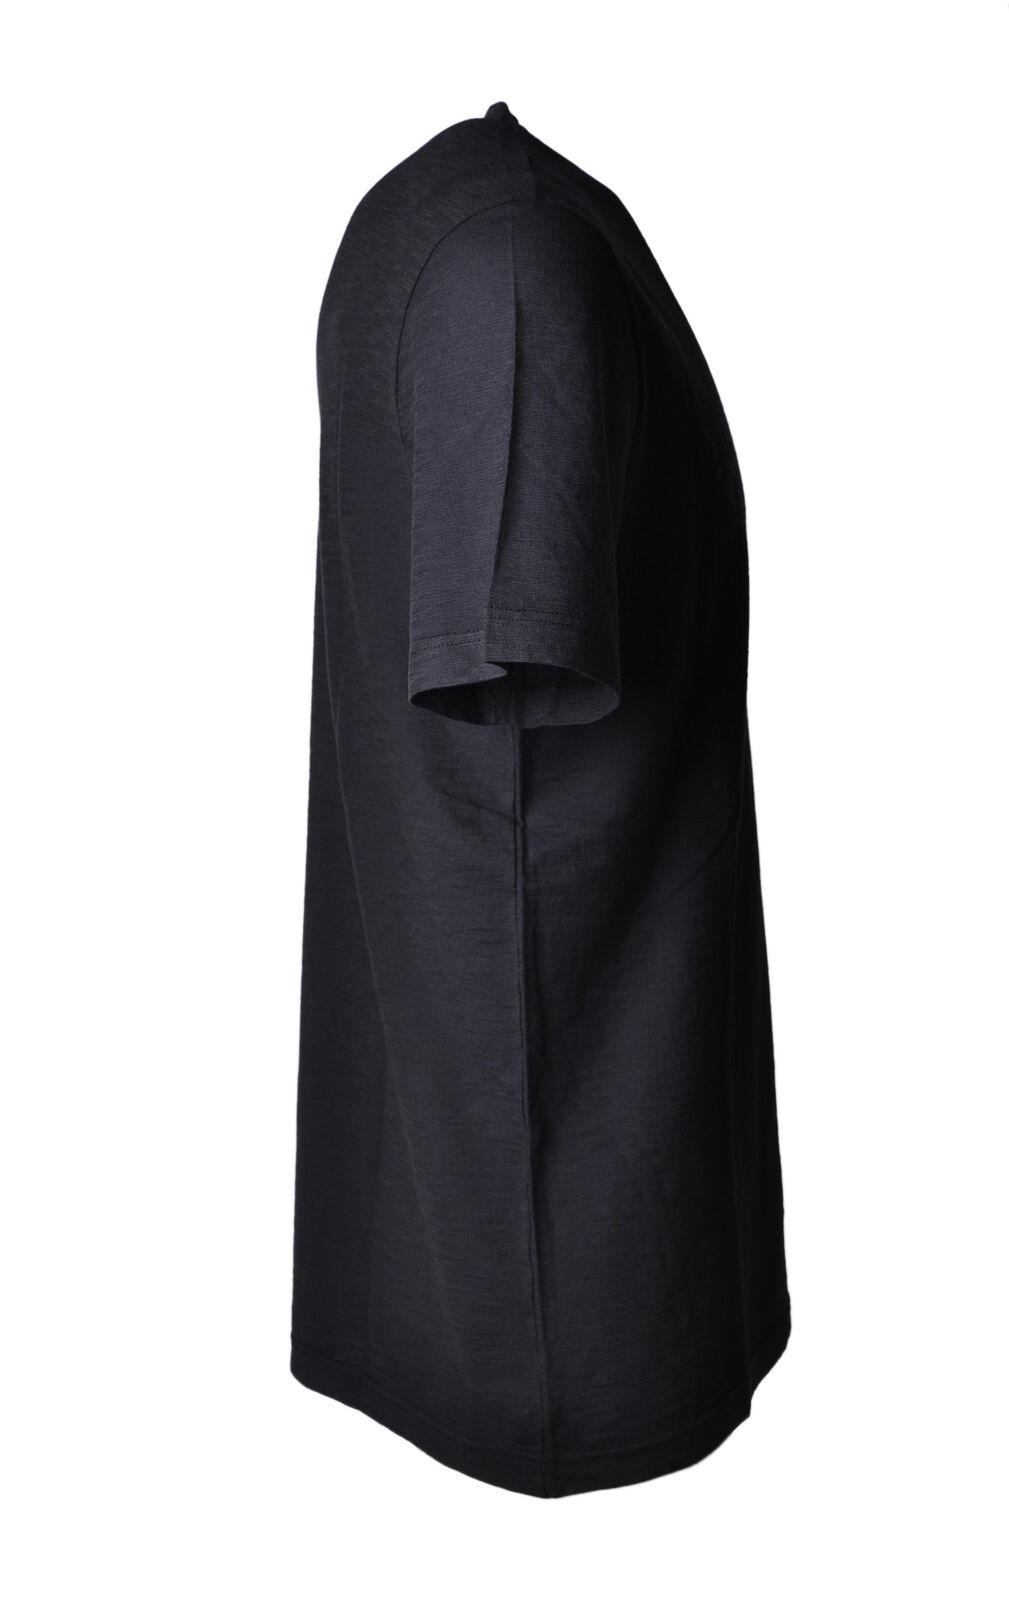 Dondup - Topwear-T-shirts Topwear-T-shirts Topwear-T-shirts - Mann - Blau - 4721706G184342 50b0db